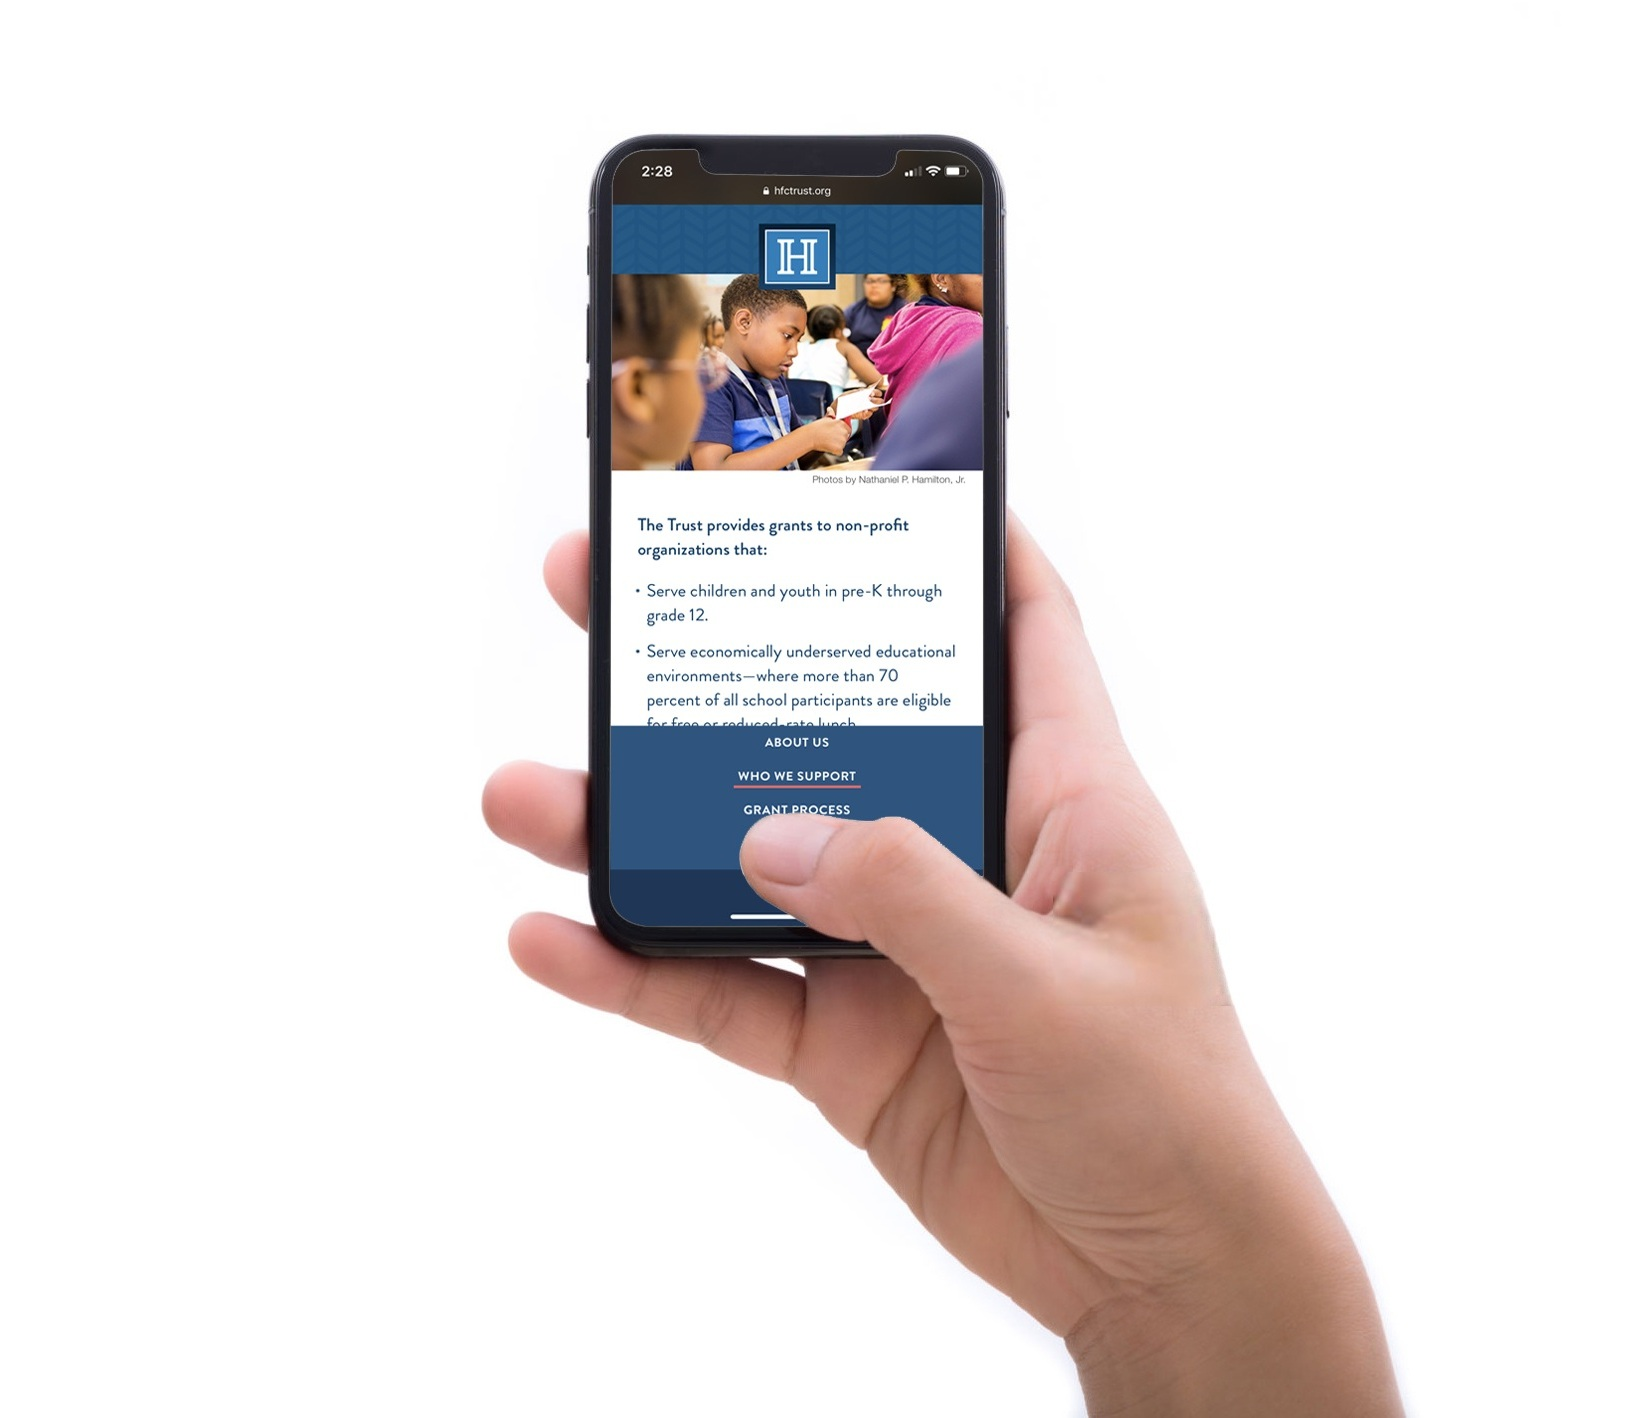 A bottom-loaded menu makes navigation easier on mobile devices.